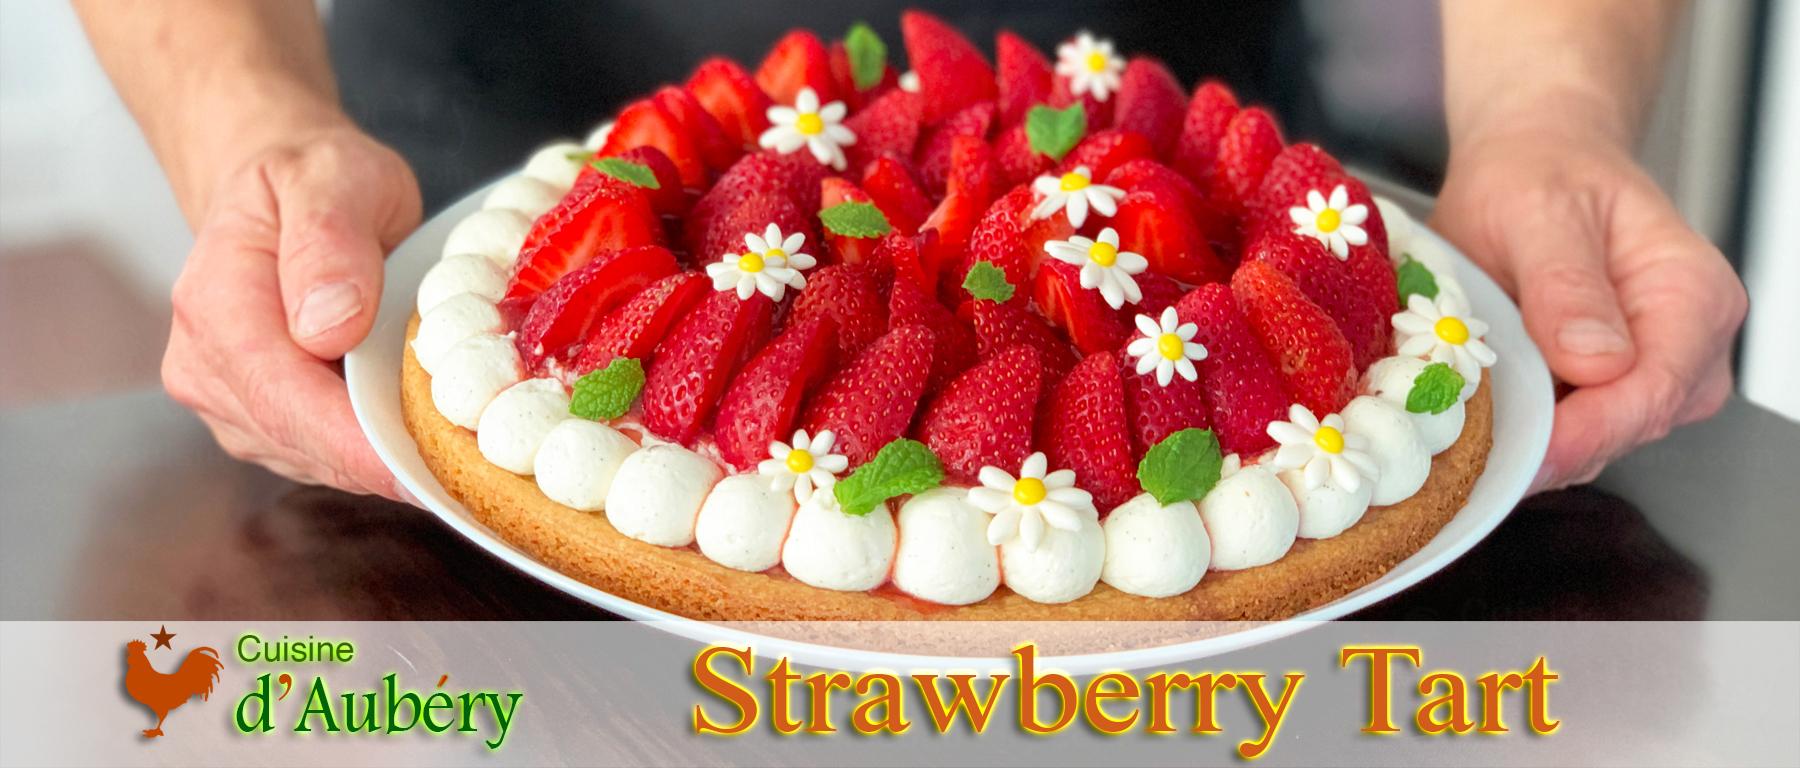 The Strawberry Tart